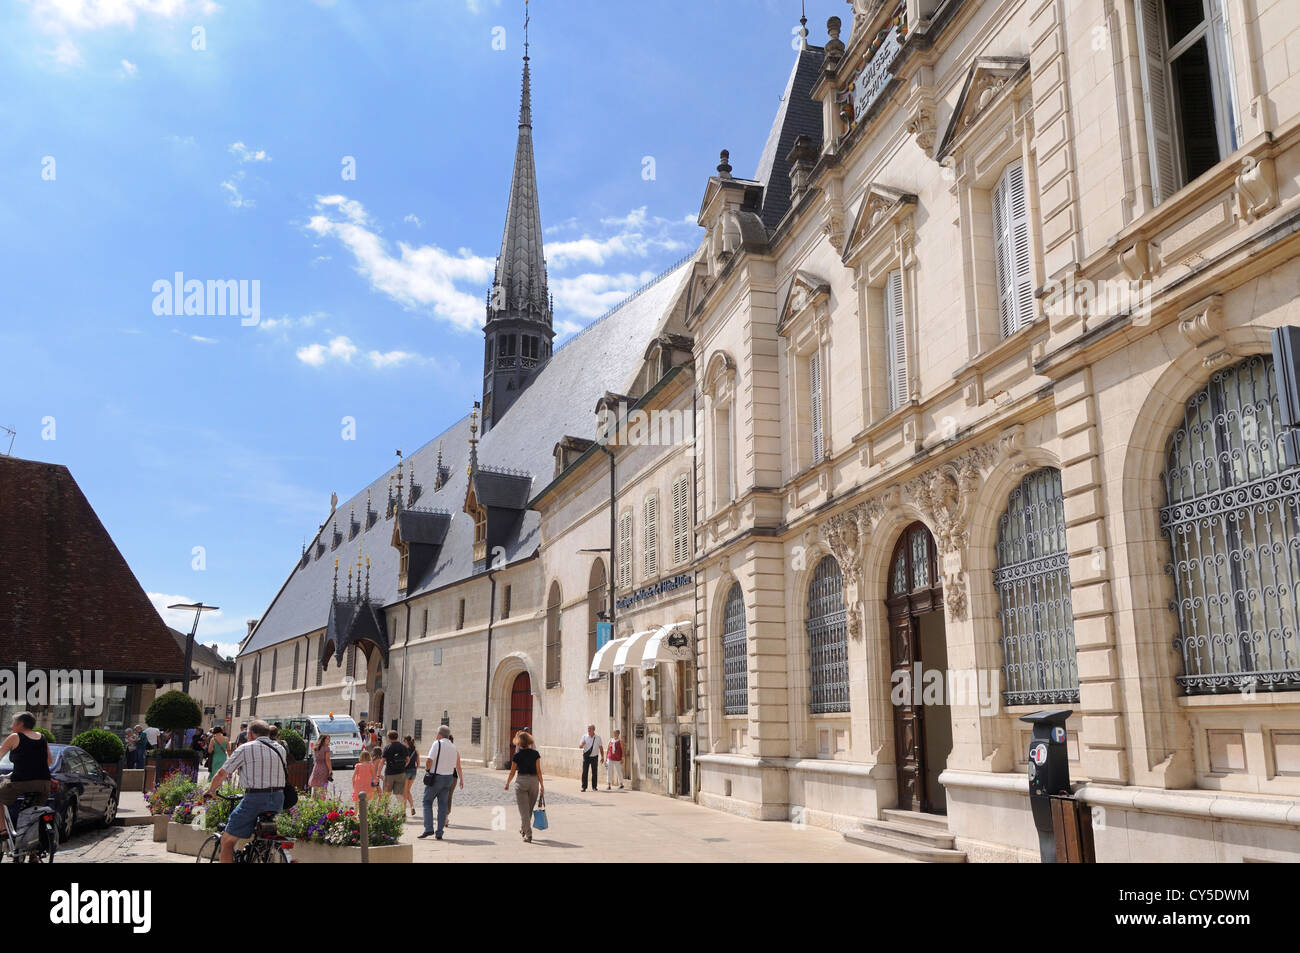 Hospice de Beaune, Hotel Dieu, Beaune, Burgundy, Cote d'Or, France, Europe - Stock Image